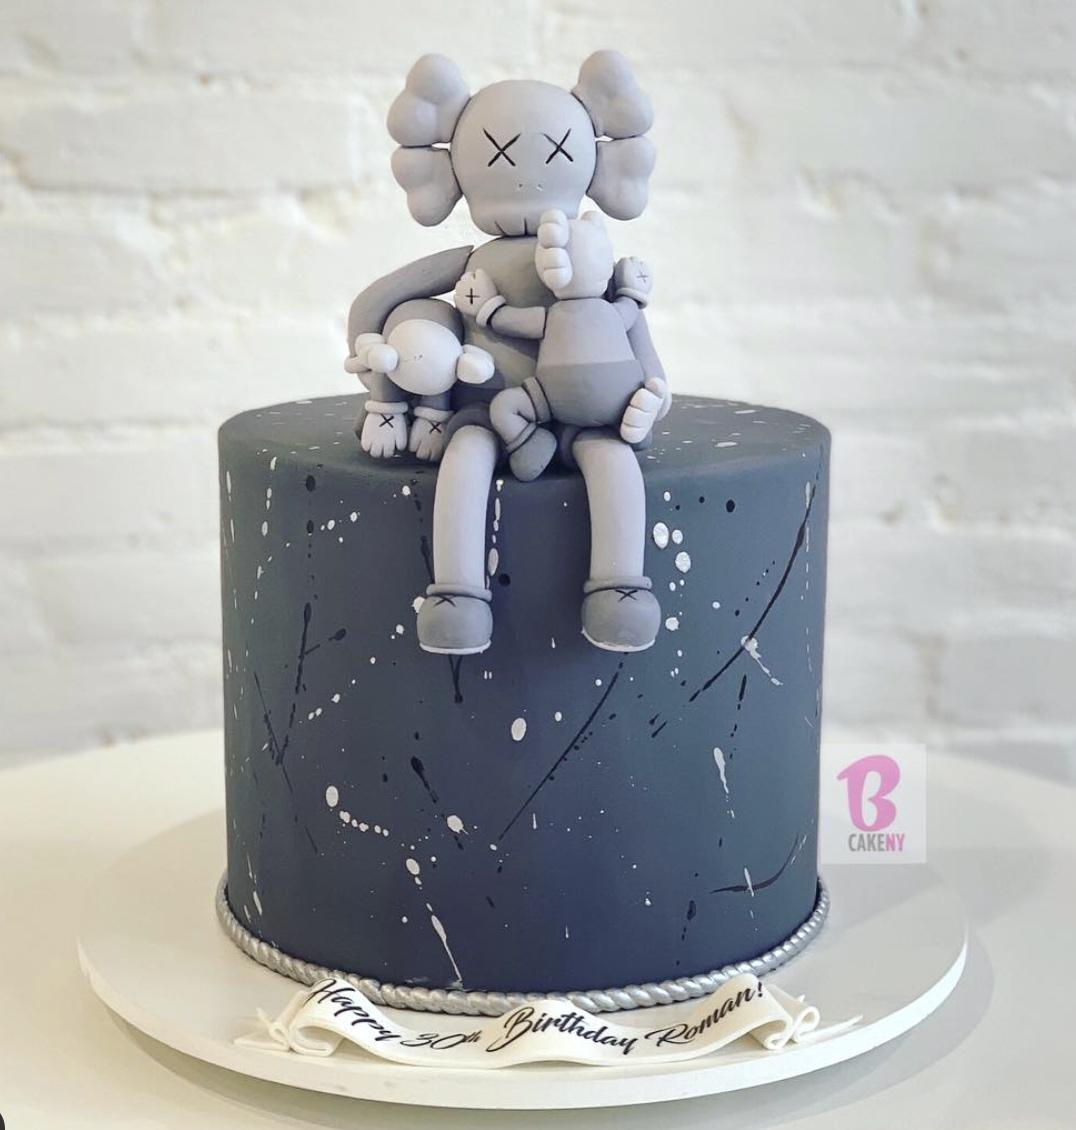 Kos family cake